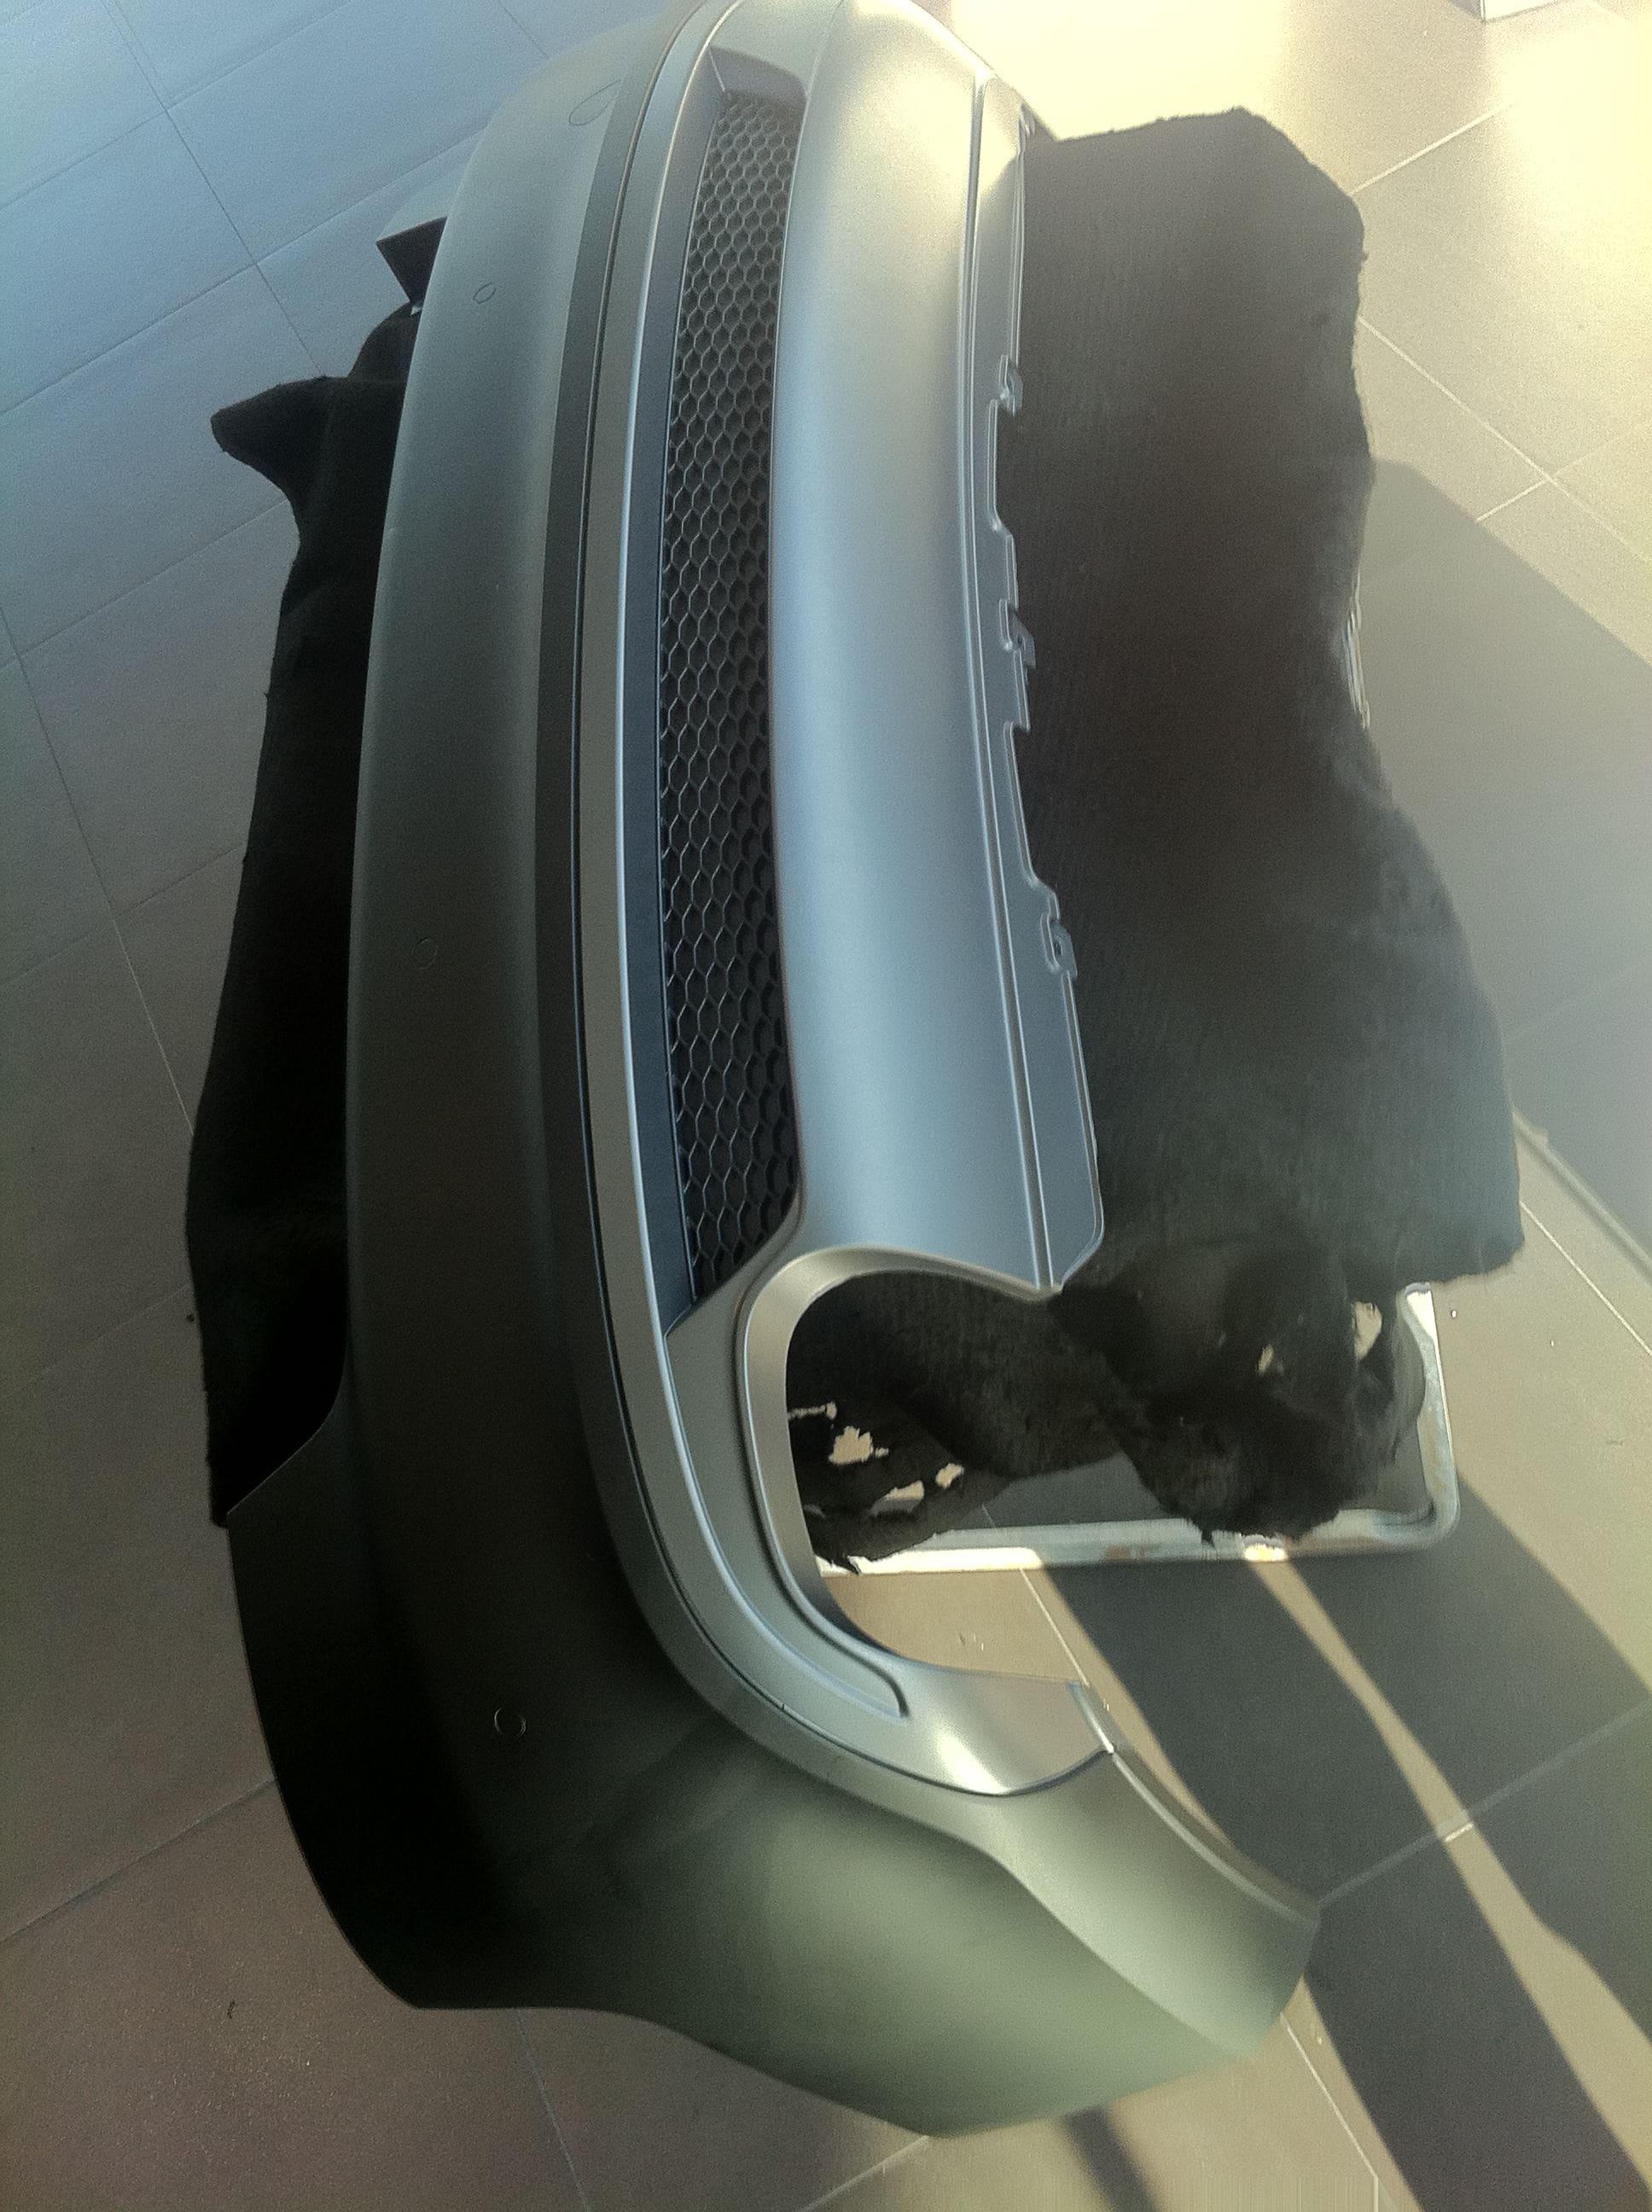 Audi A5 Coupe met Mat Zwarte Wrap, Carwrapping door Wrapmyride.nu Foto-nr:4581, ©2021